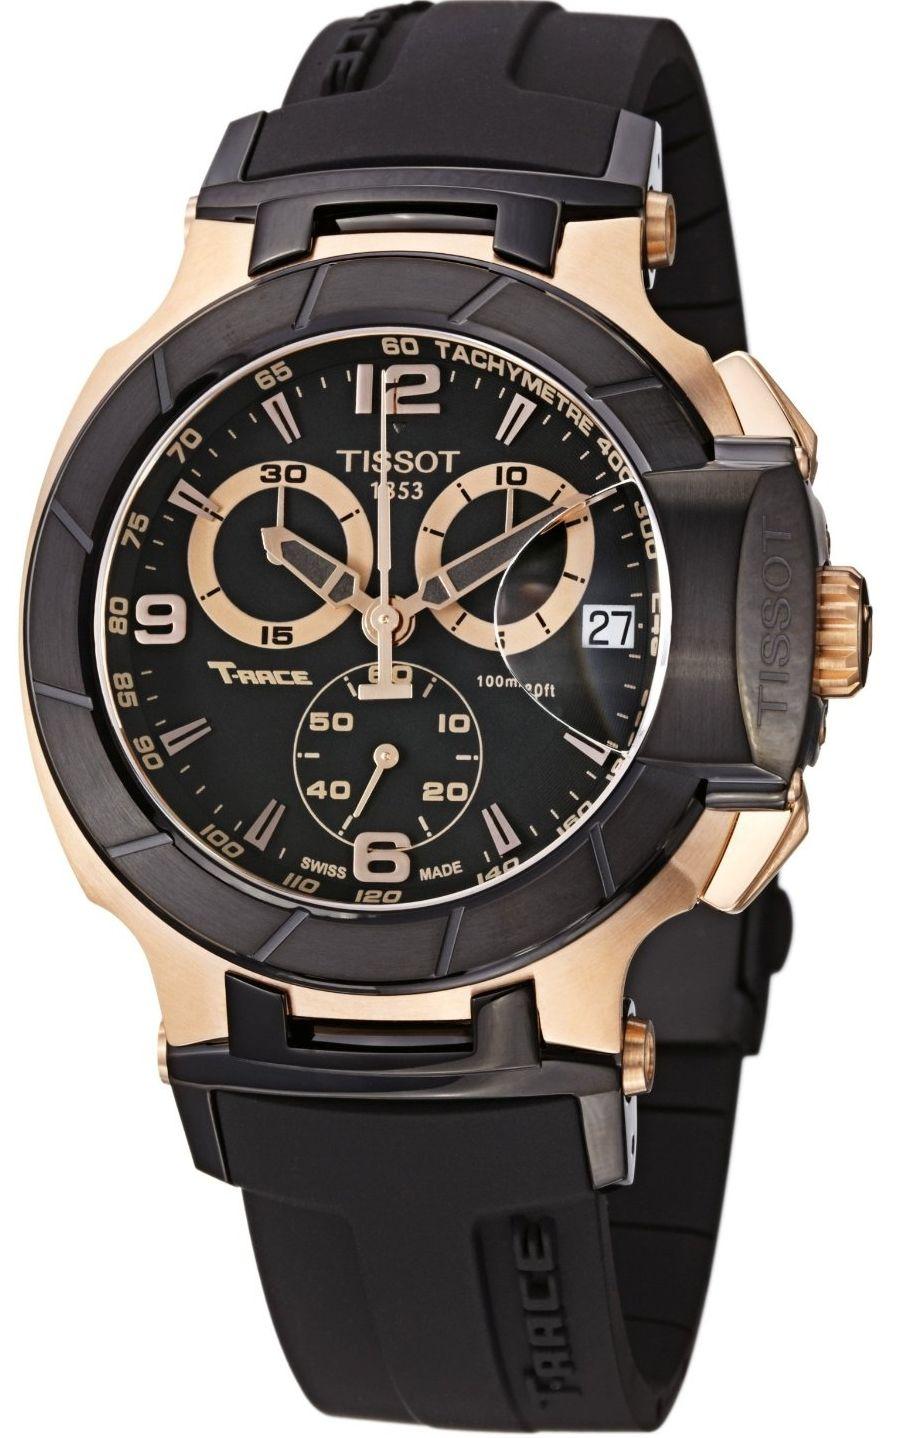 Tissot Men S Strap Watch Watches For Men Mens Watches Black Chronograph Watch Men